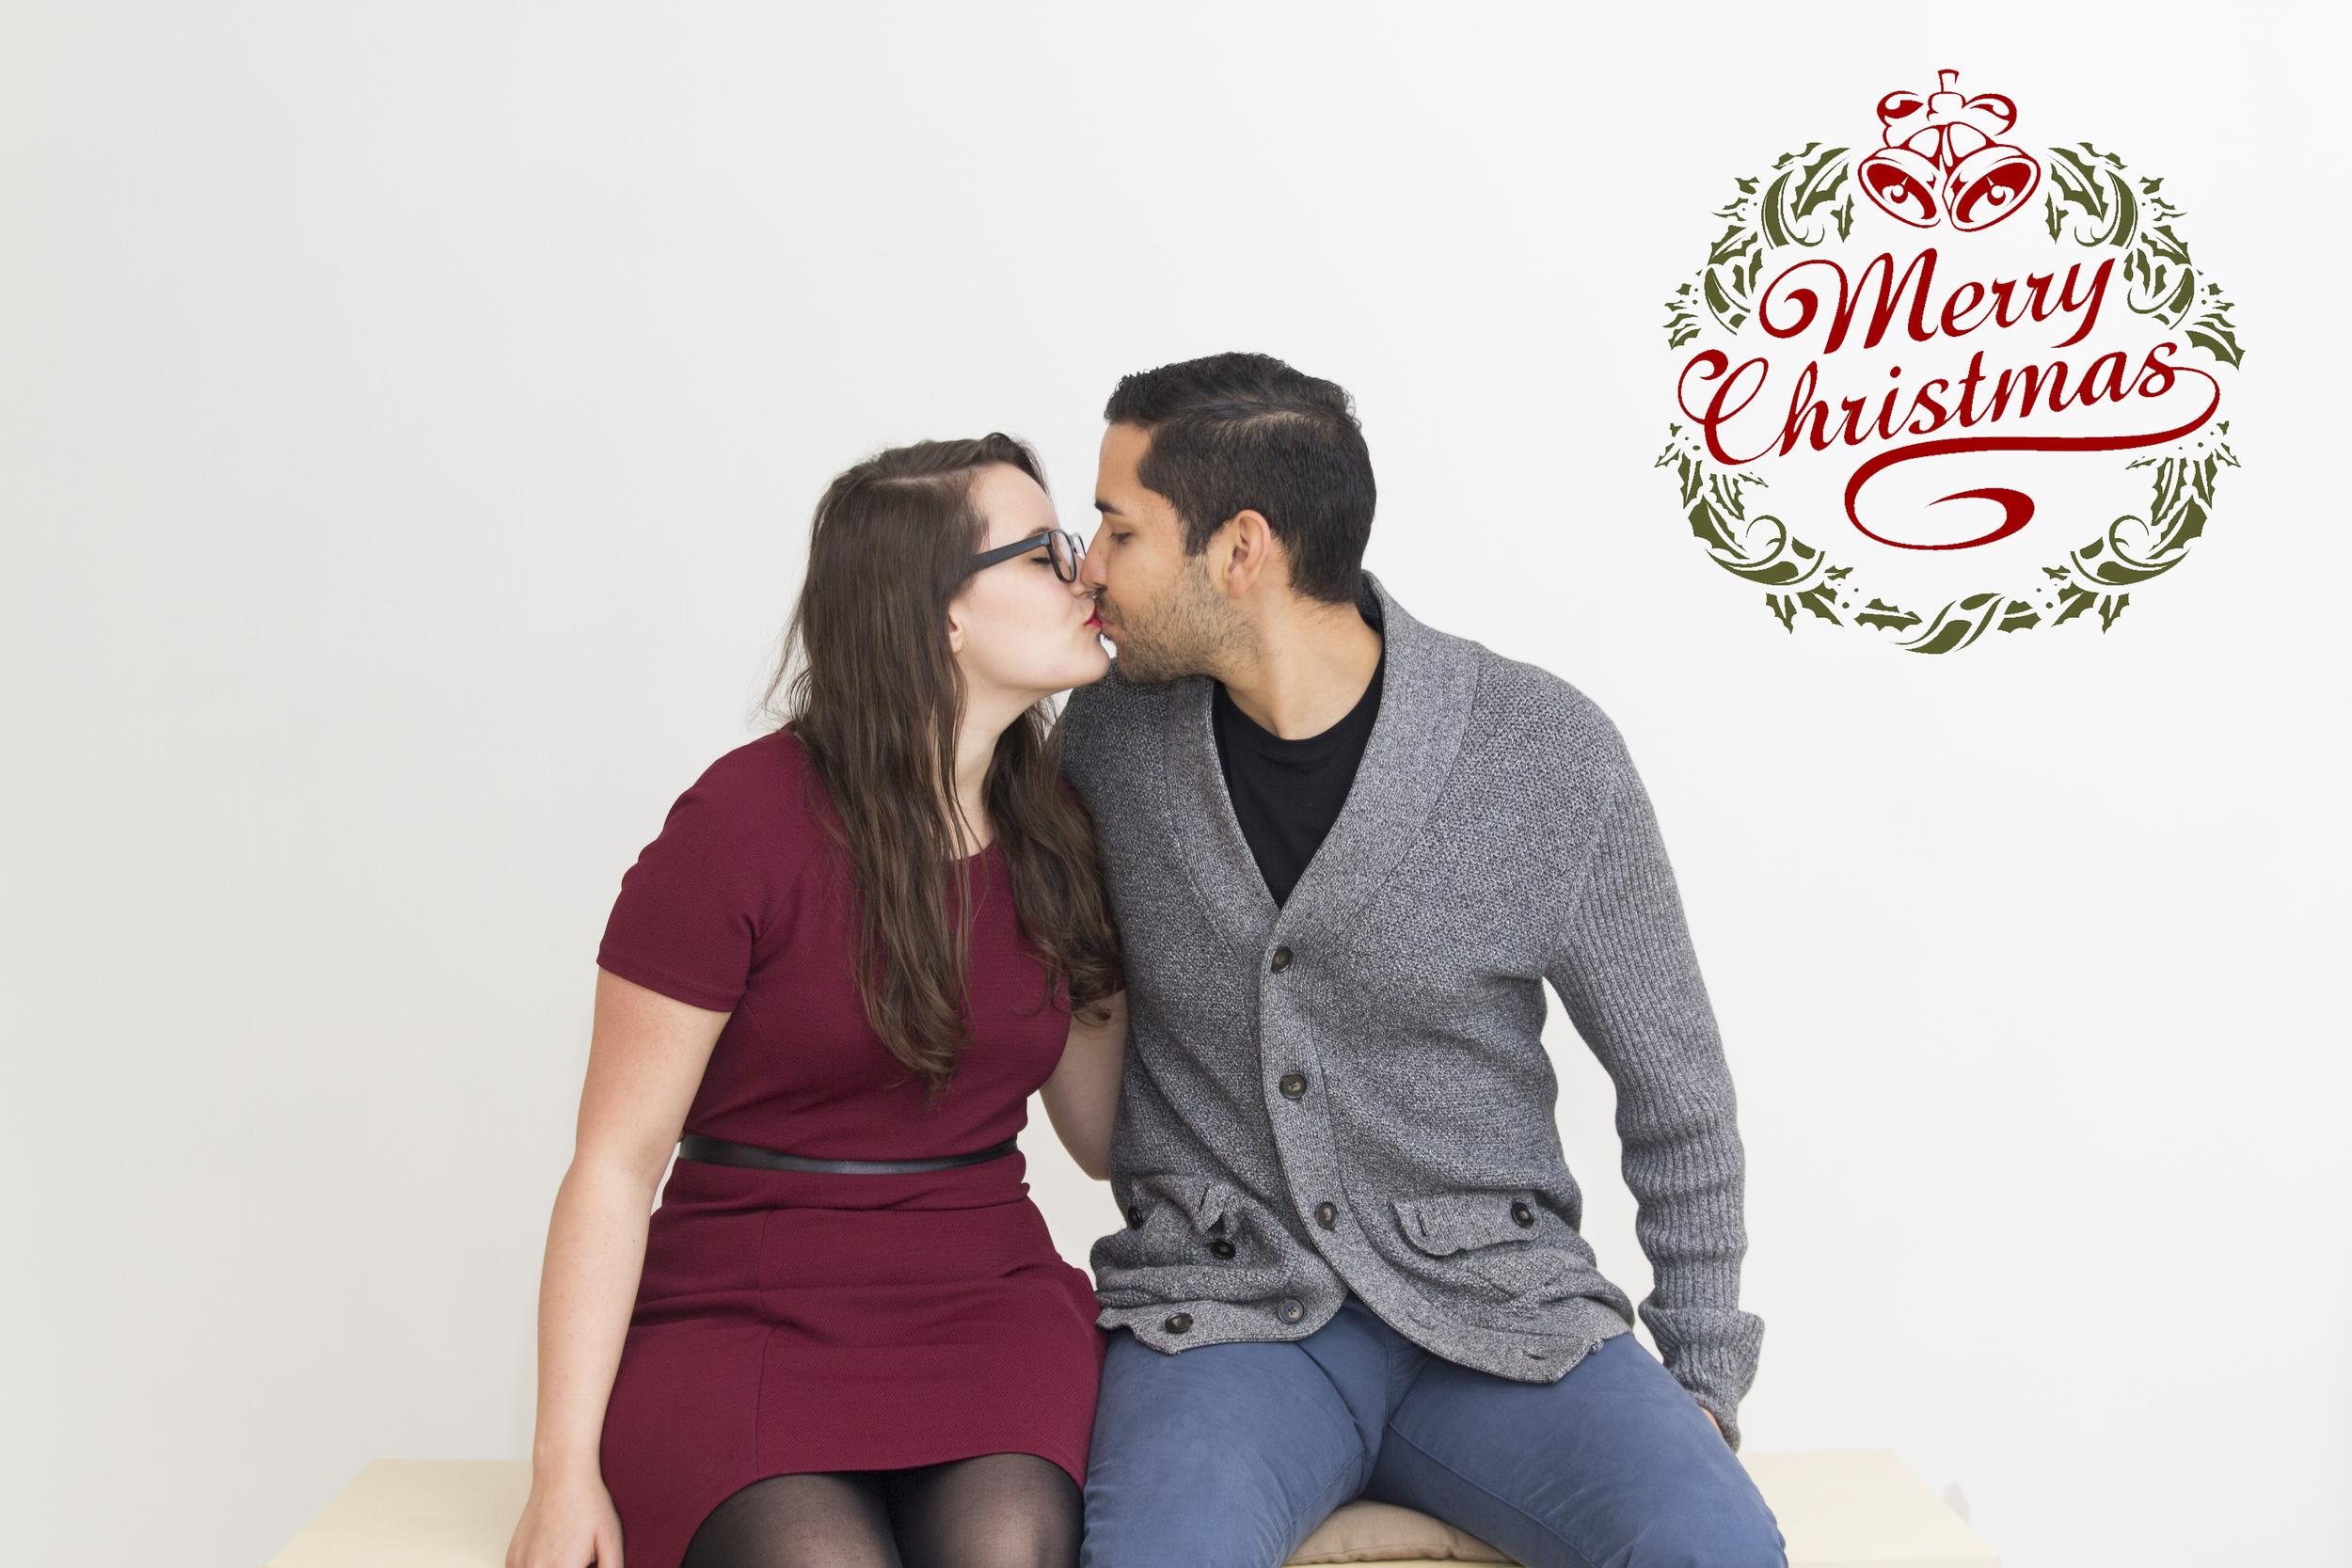 20151220_Ingrid and Luis Holiday Photos_0629-2.jpg